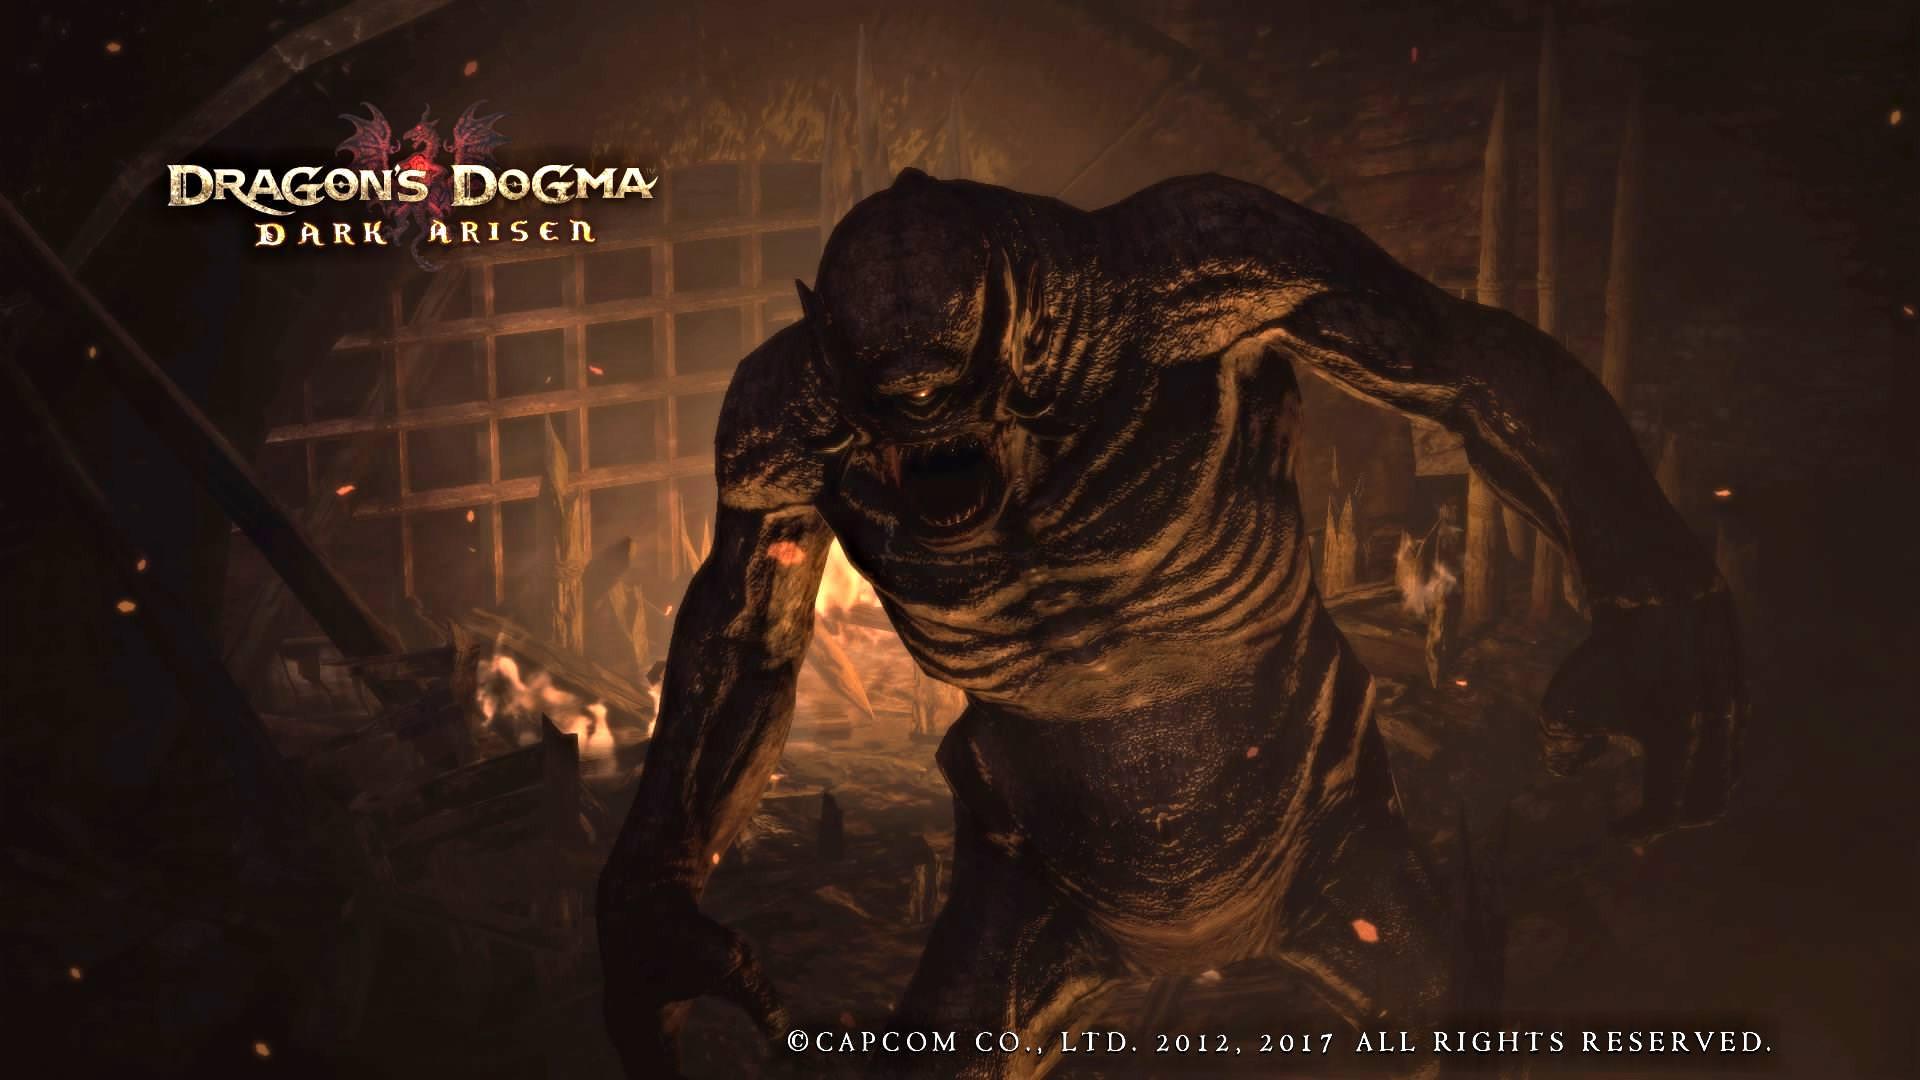 Gorecyclops dragons dogma gold idol golden dragon ninjago amazon